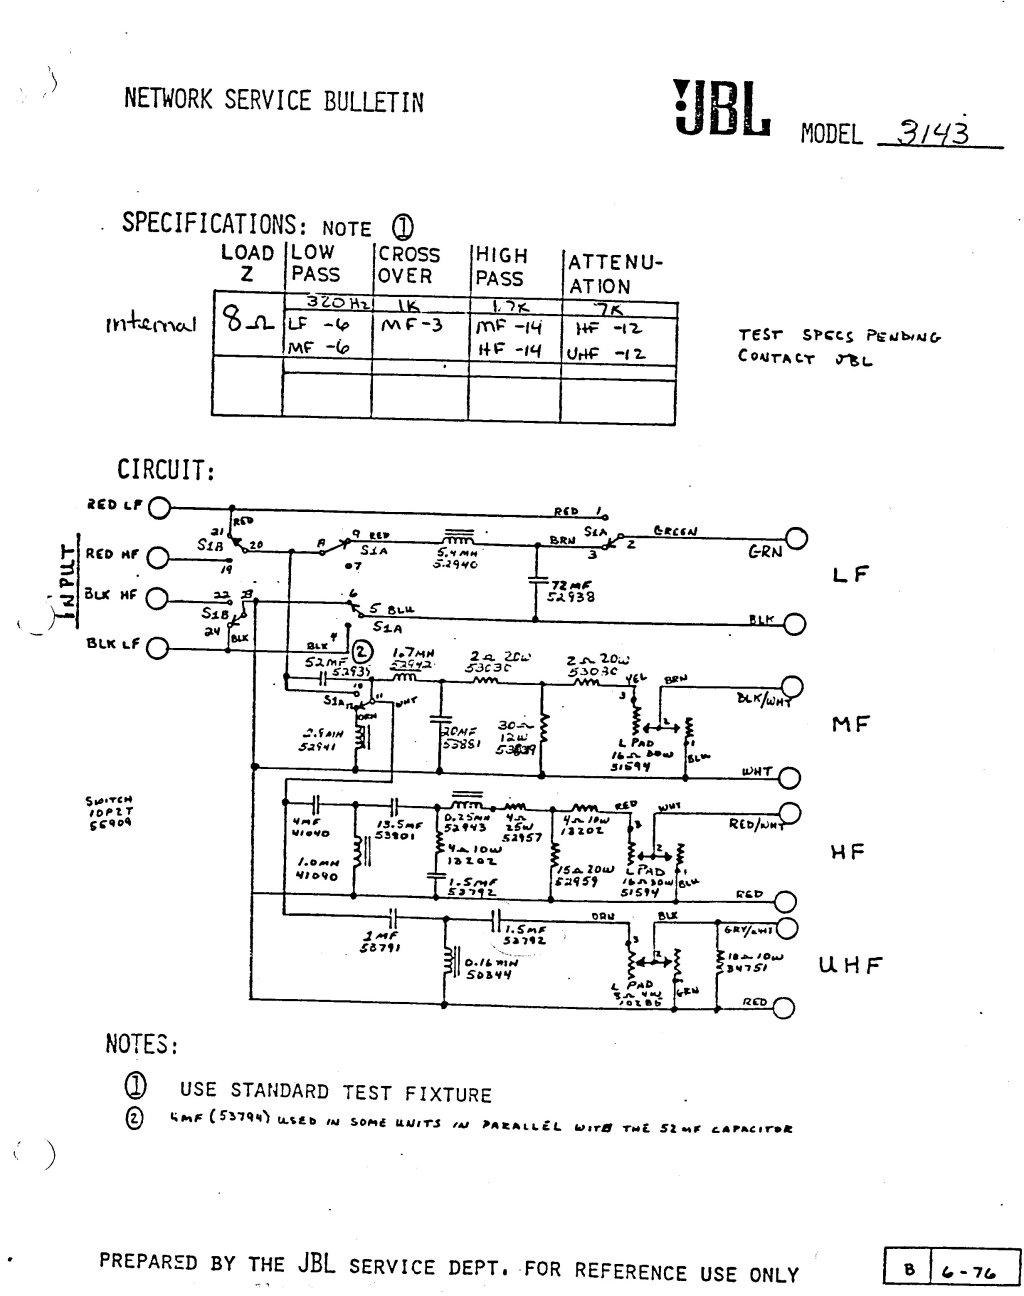 Filtre actif JBL/UREI 5235 - Page 2 3143_n10